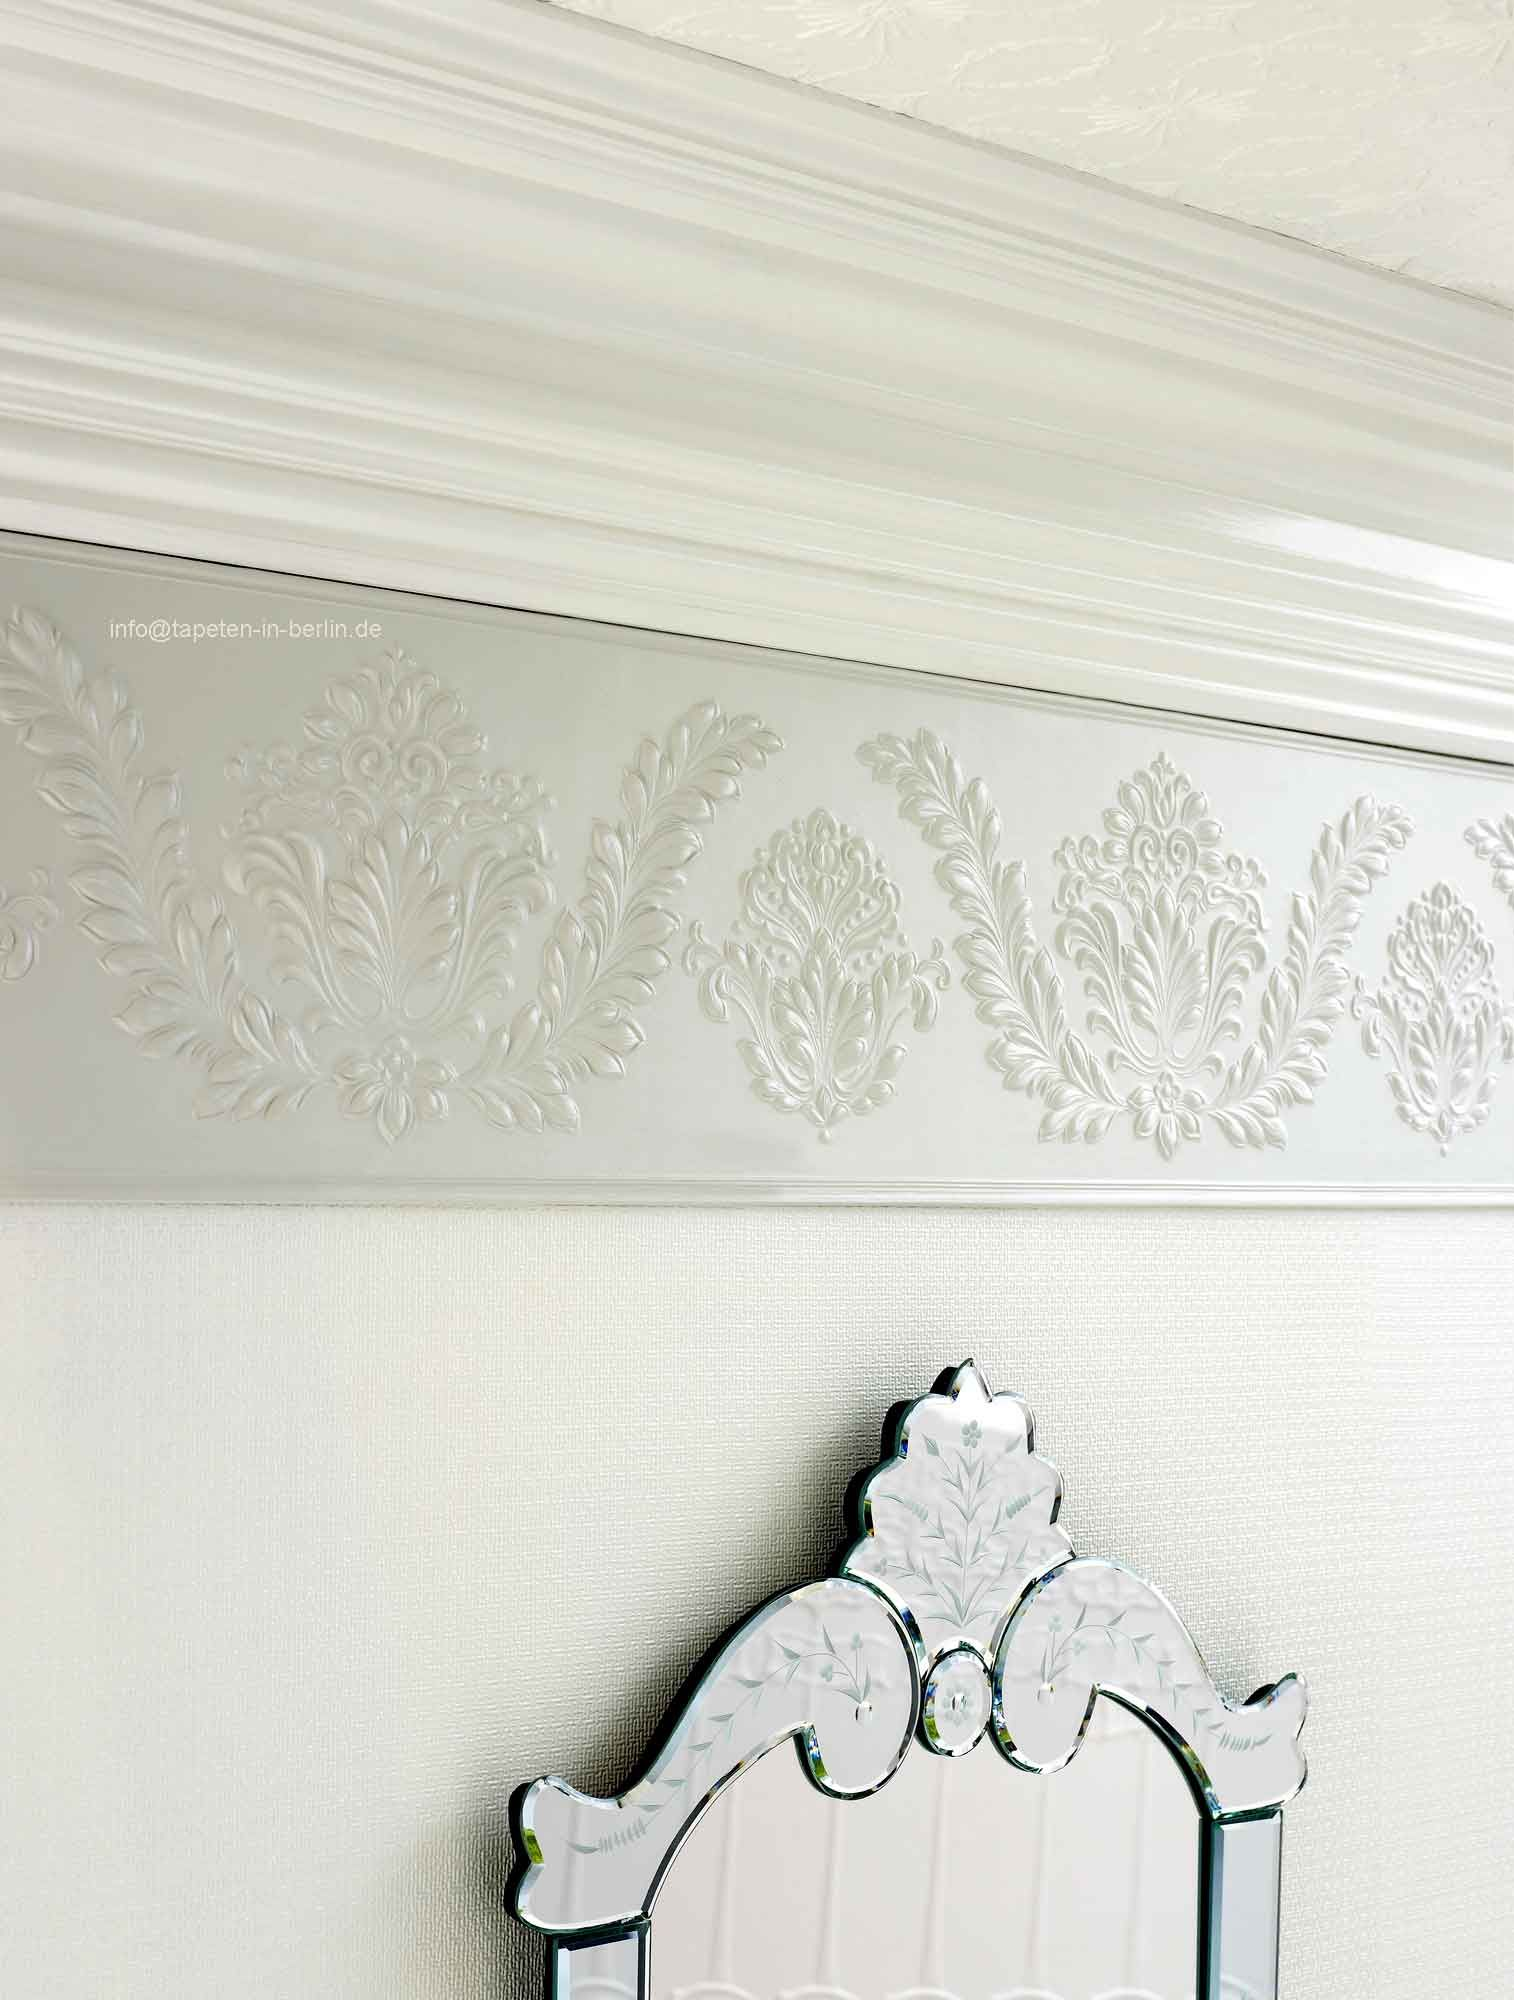 Lincrusta Stil Bordüre - Linkrusta wallpaper 1A online kaufen ...